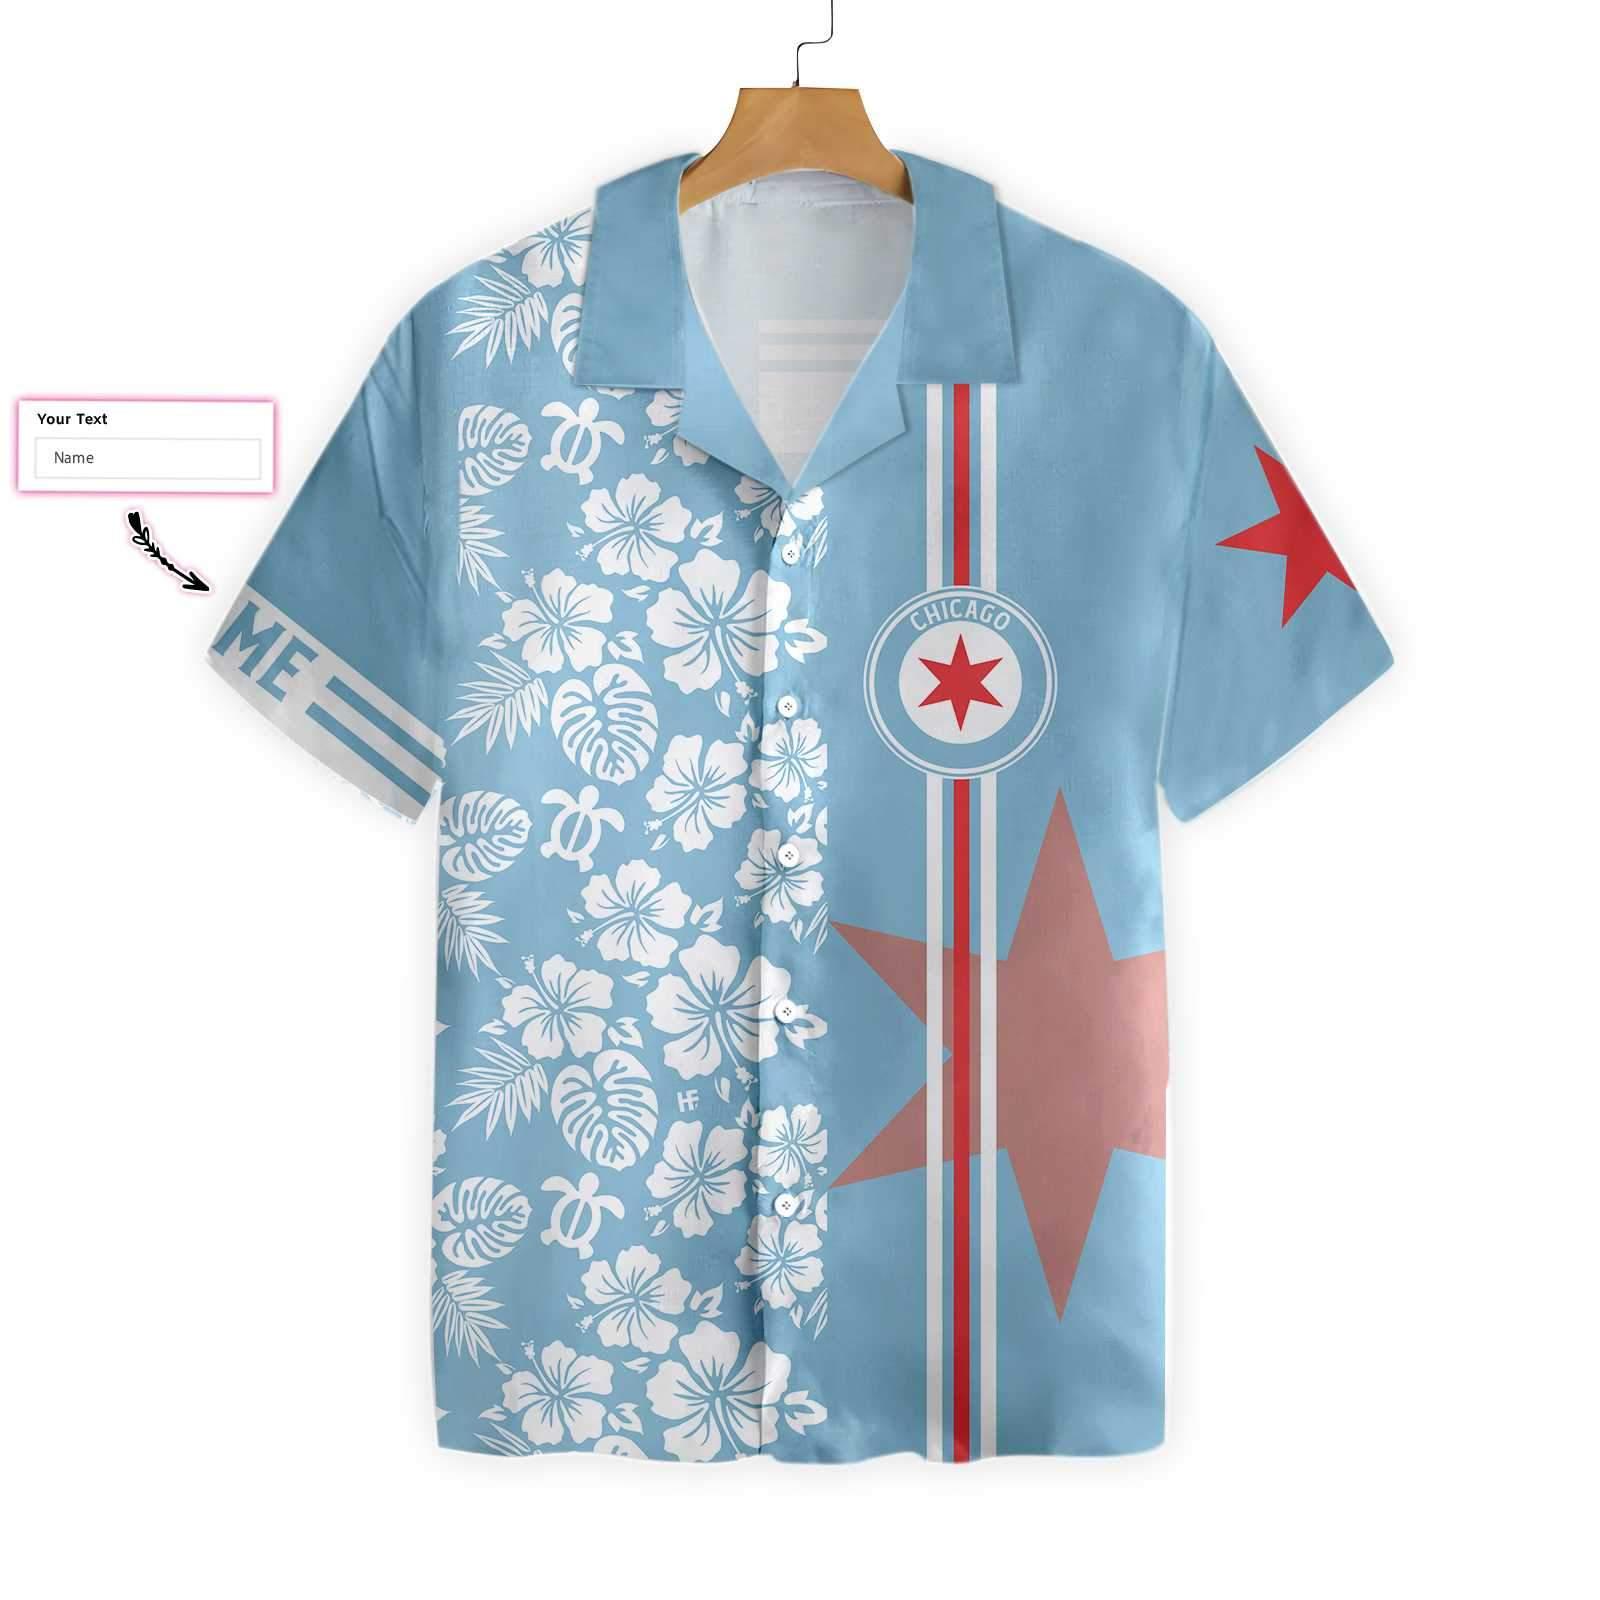 Personalized Chicago Hawaiian Shirt 2